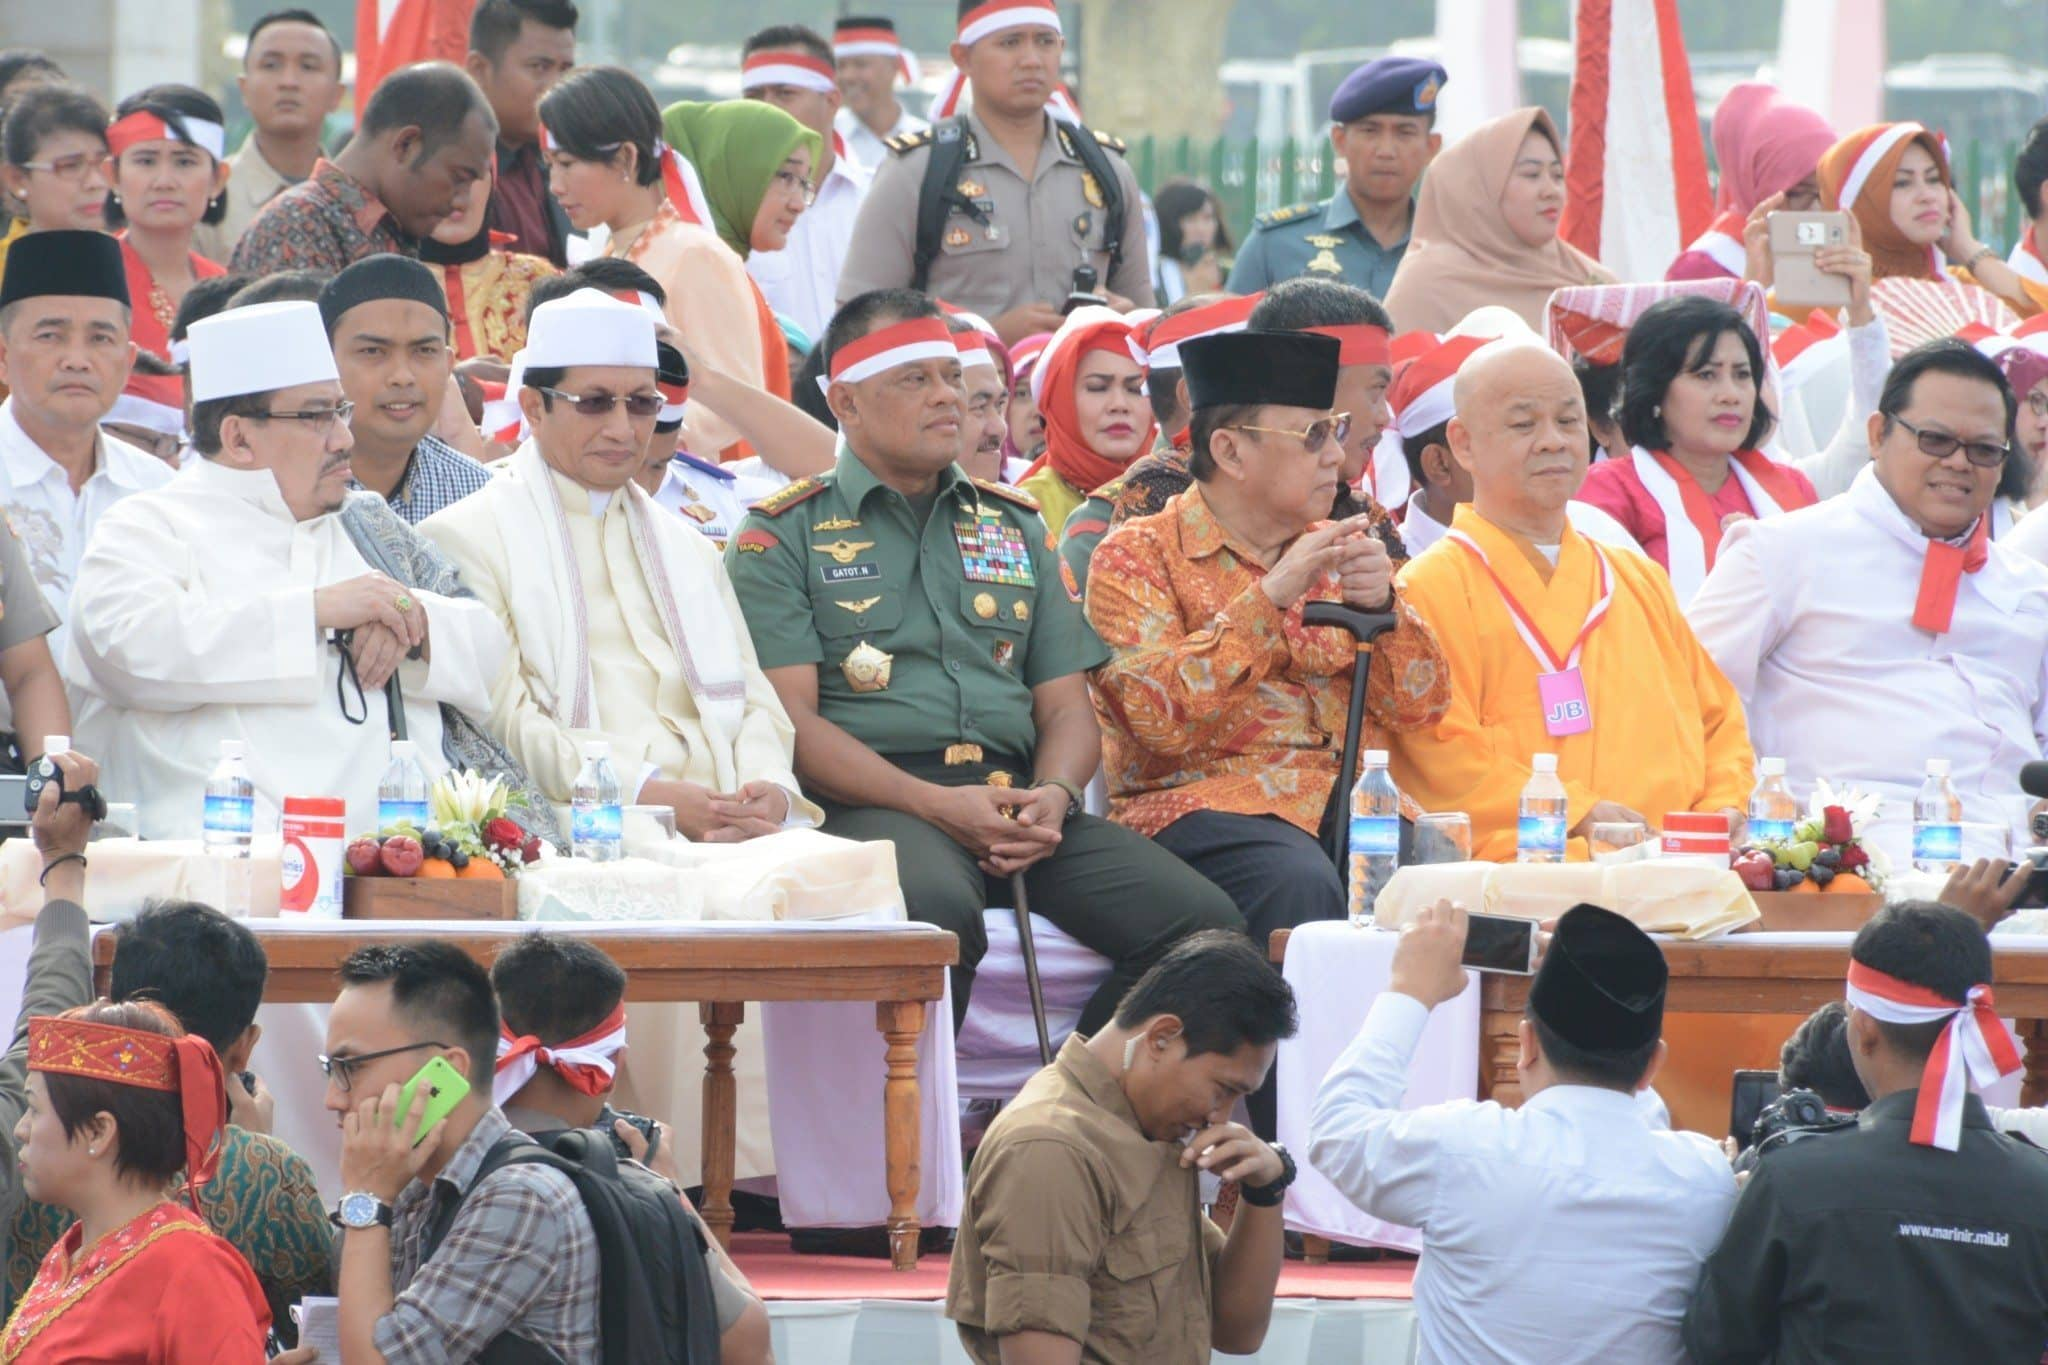 Nusantara Bersatu, Jakarta 30 November 2016